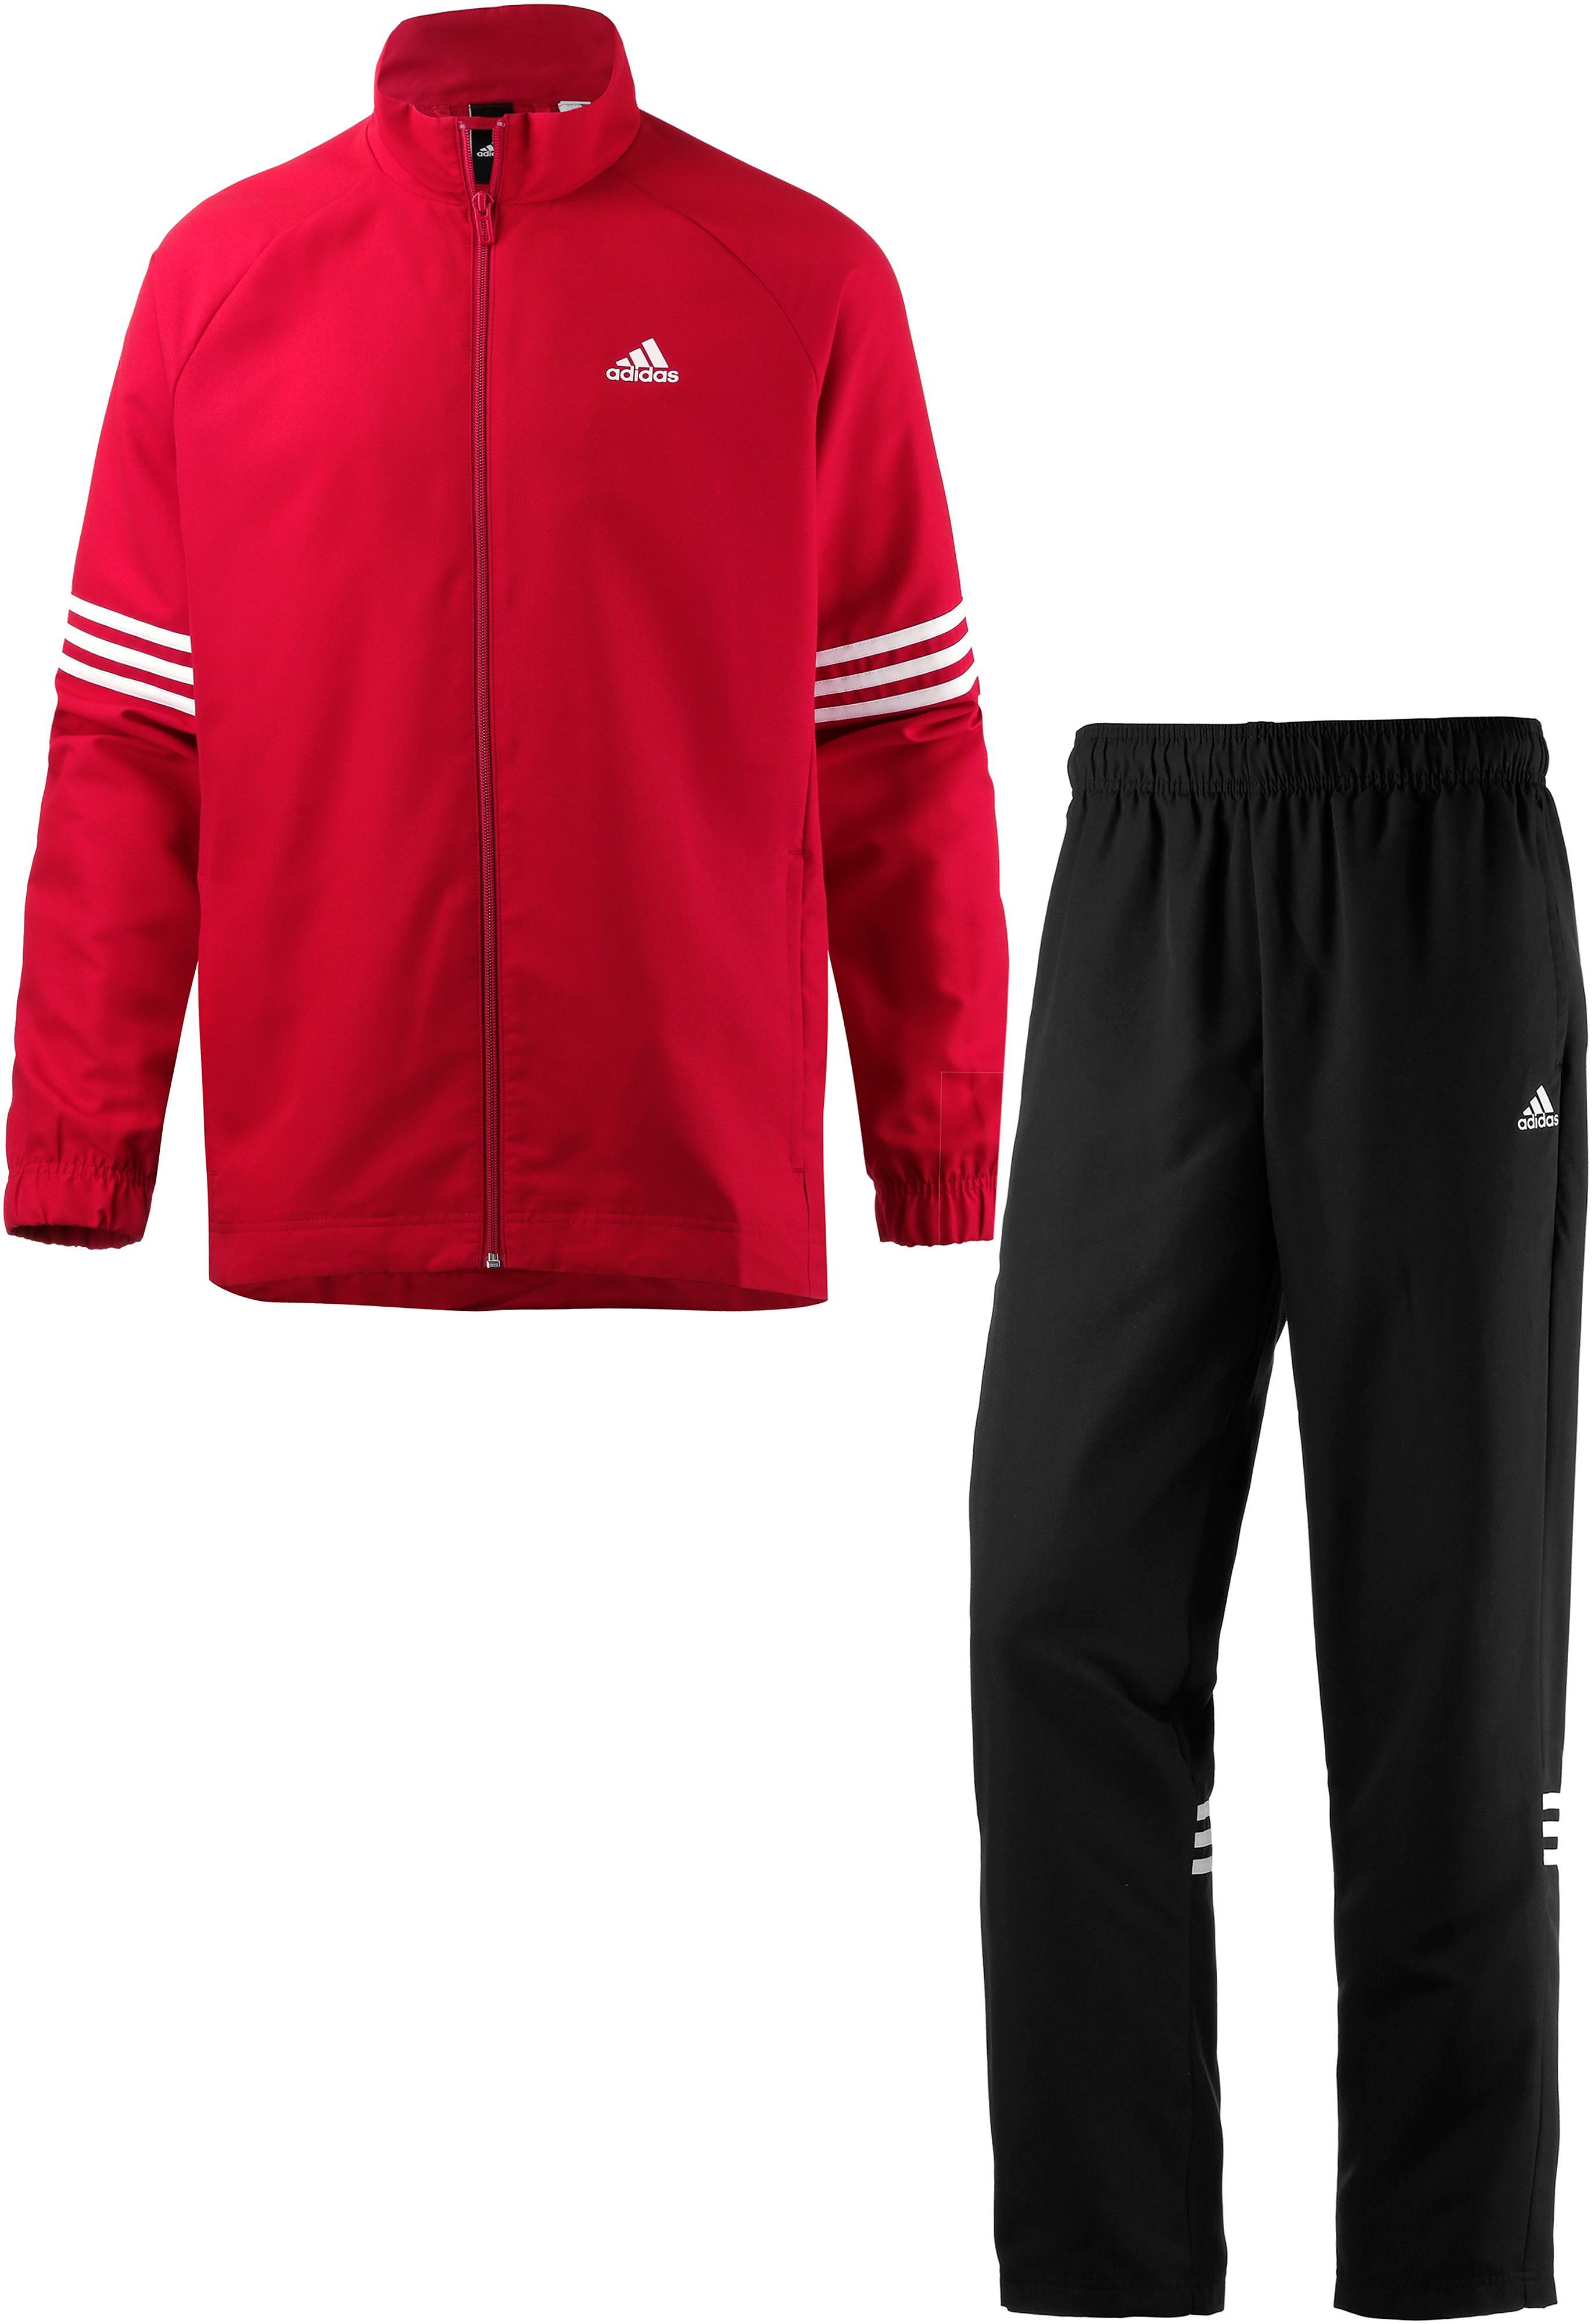 Adidas Trainingsanzug bei OTTO | Adidas Trainingsanzüge